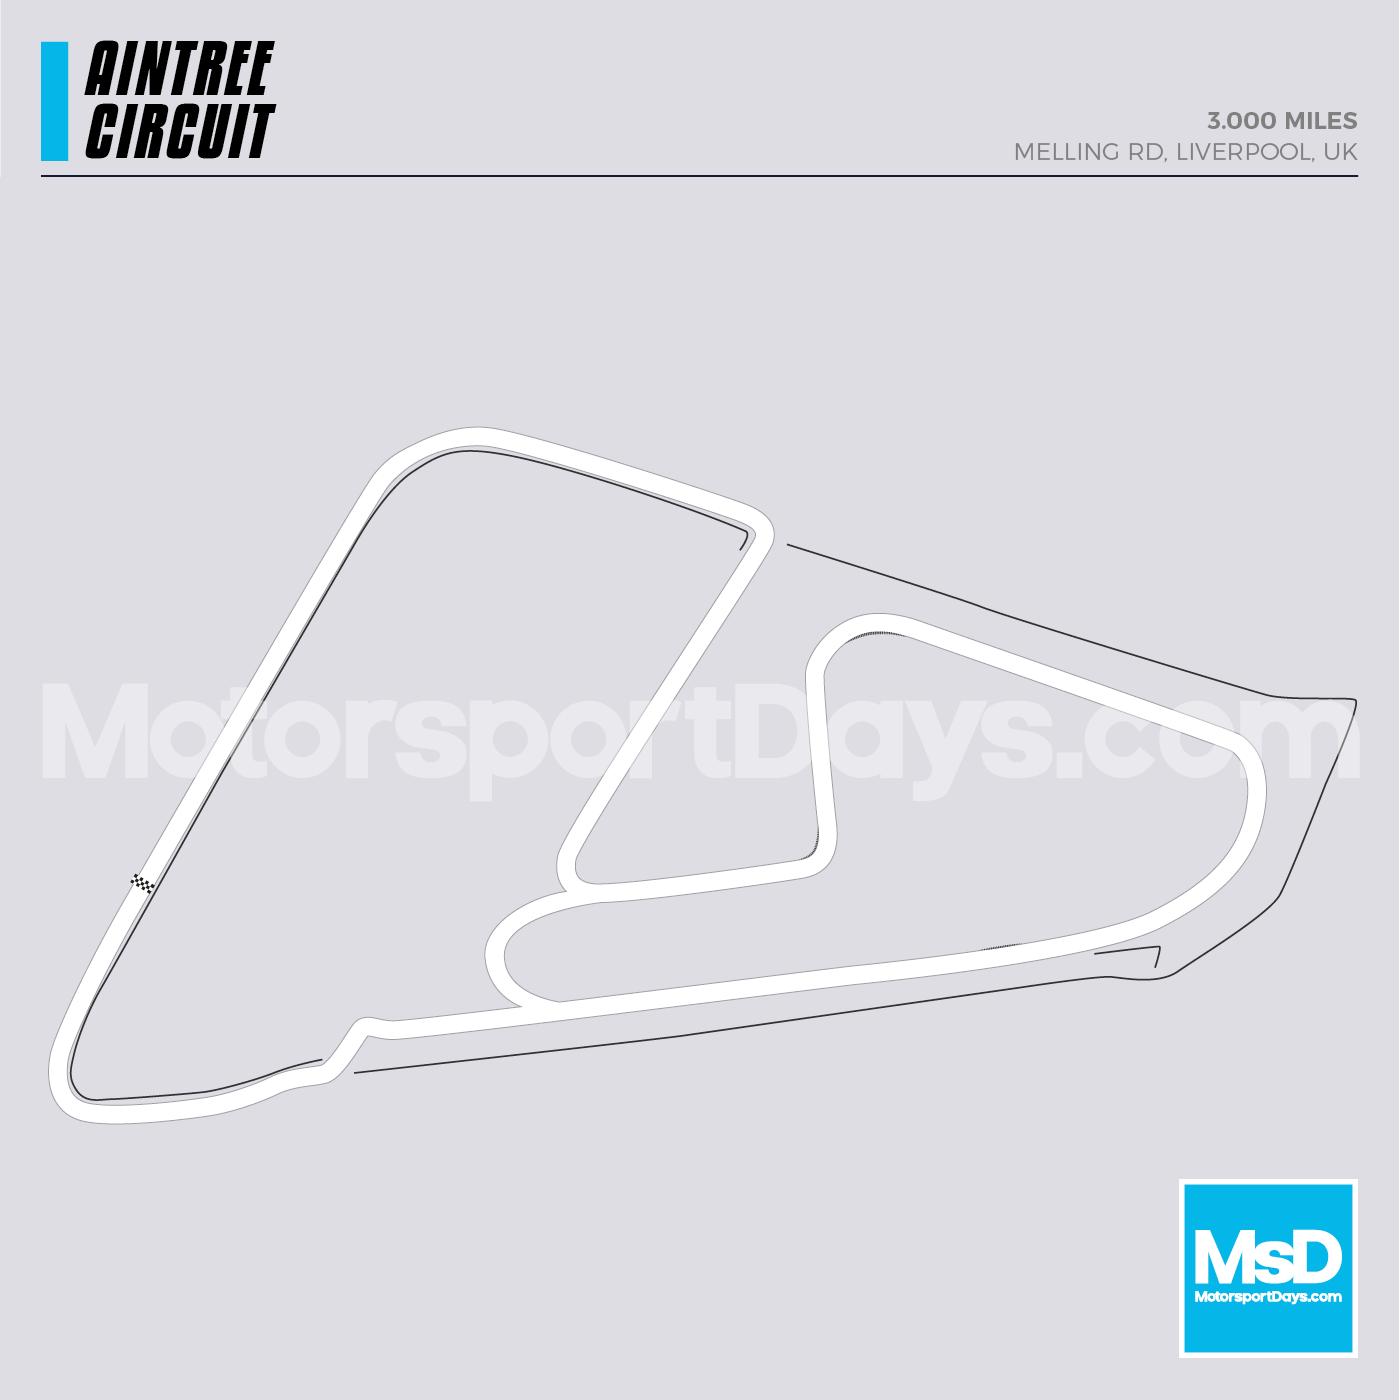 Aintree-Circuit-track-map